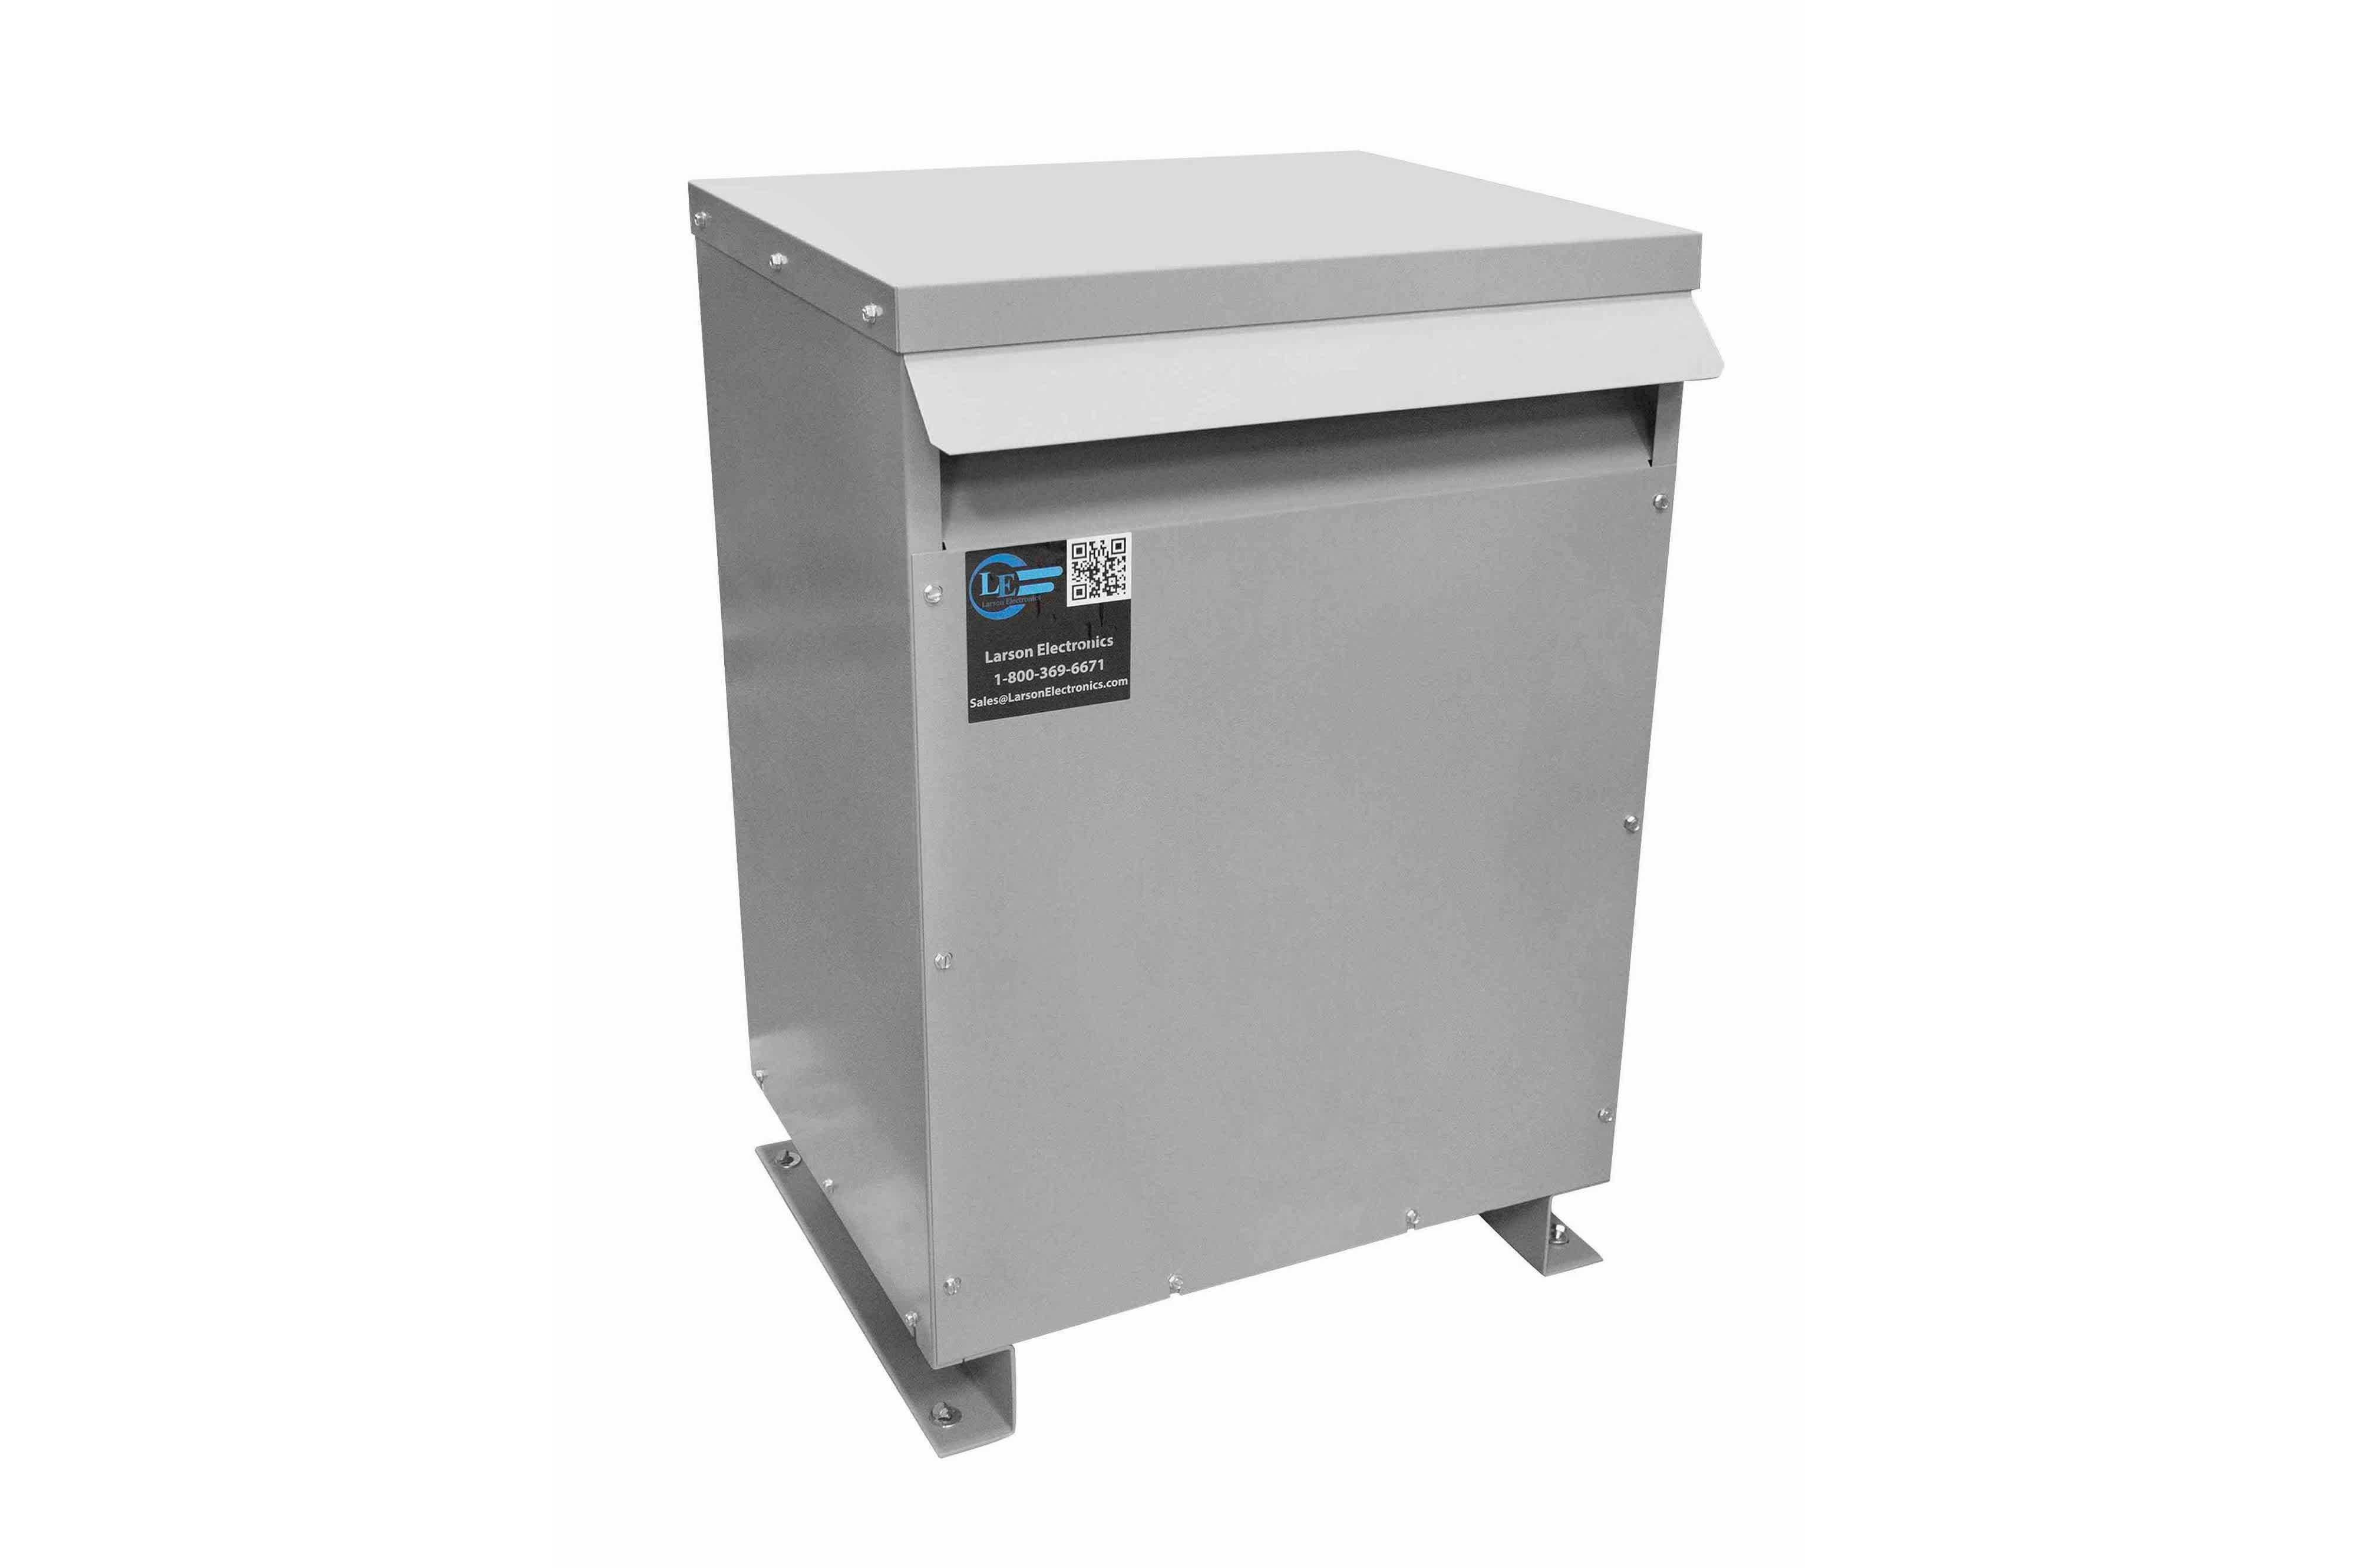 100 kVA 3PH Isolation Transformer, 460V Wye Primary, 380Y/220 Wye-N Secondary, N3R, Ventilated, 60 Hz